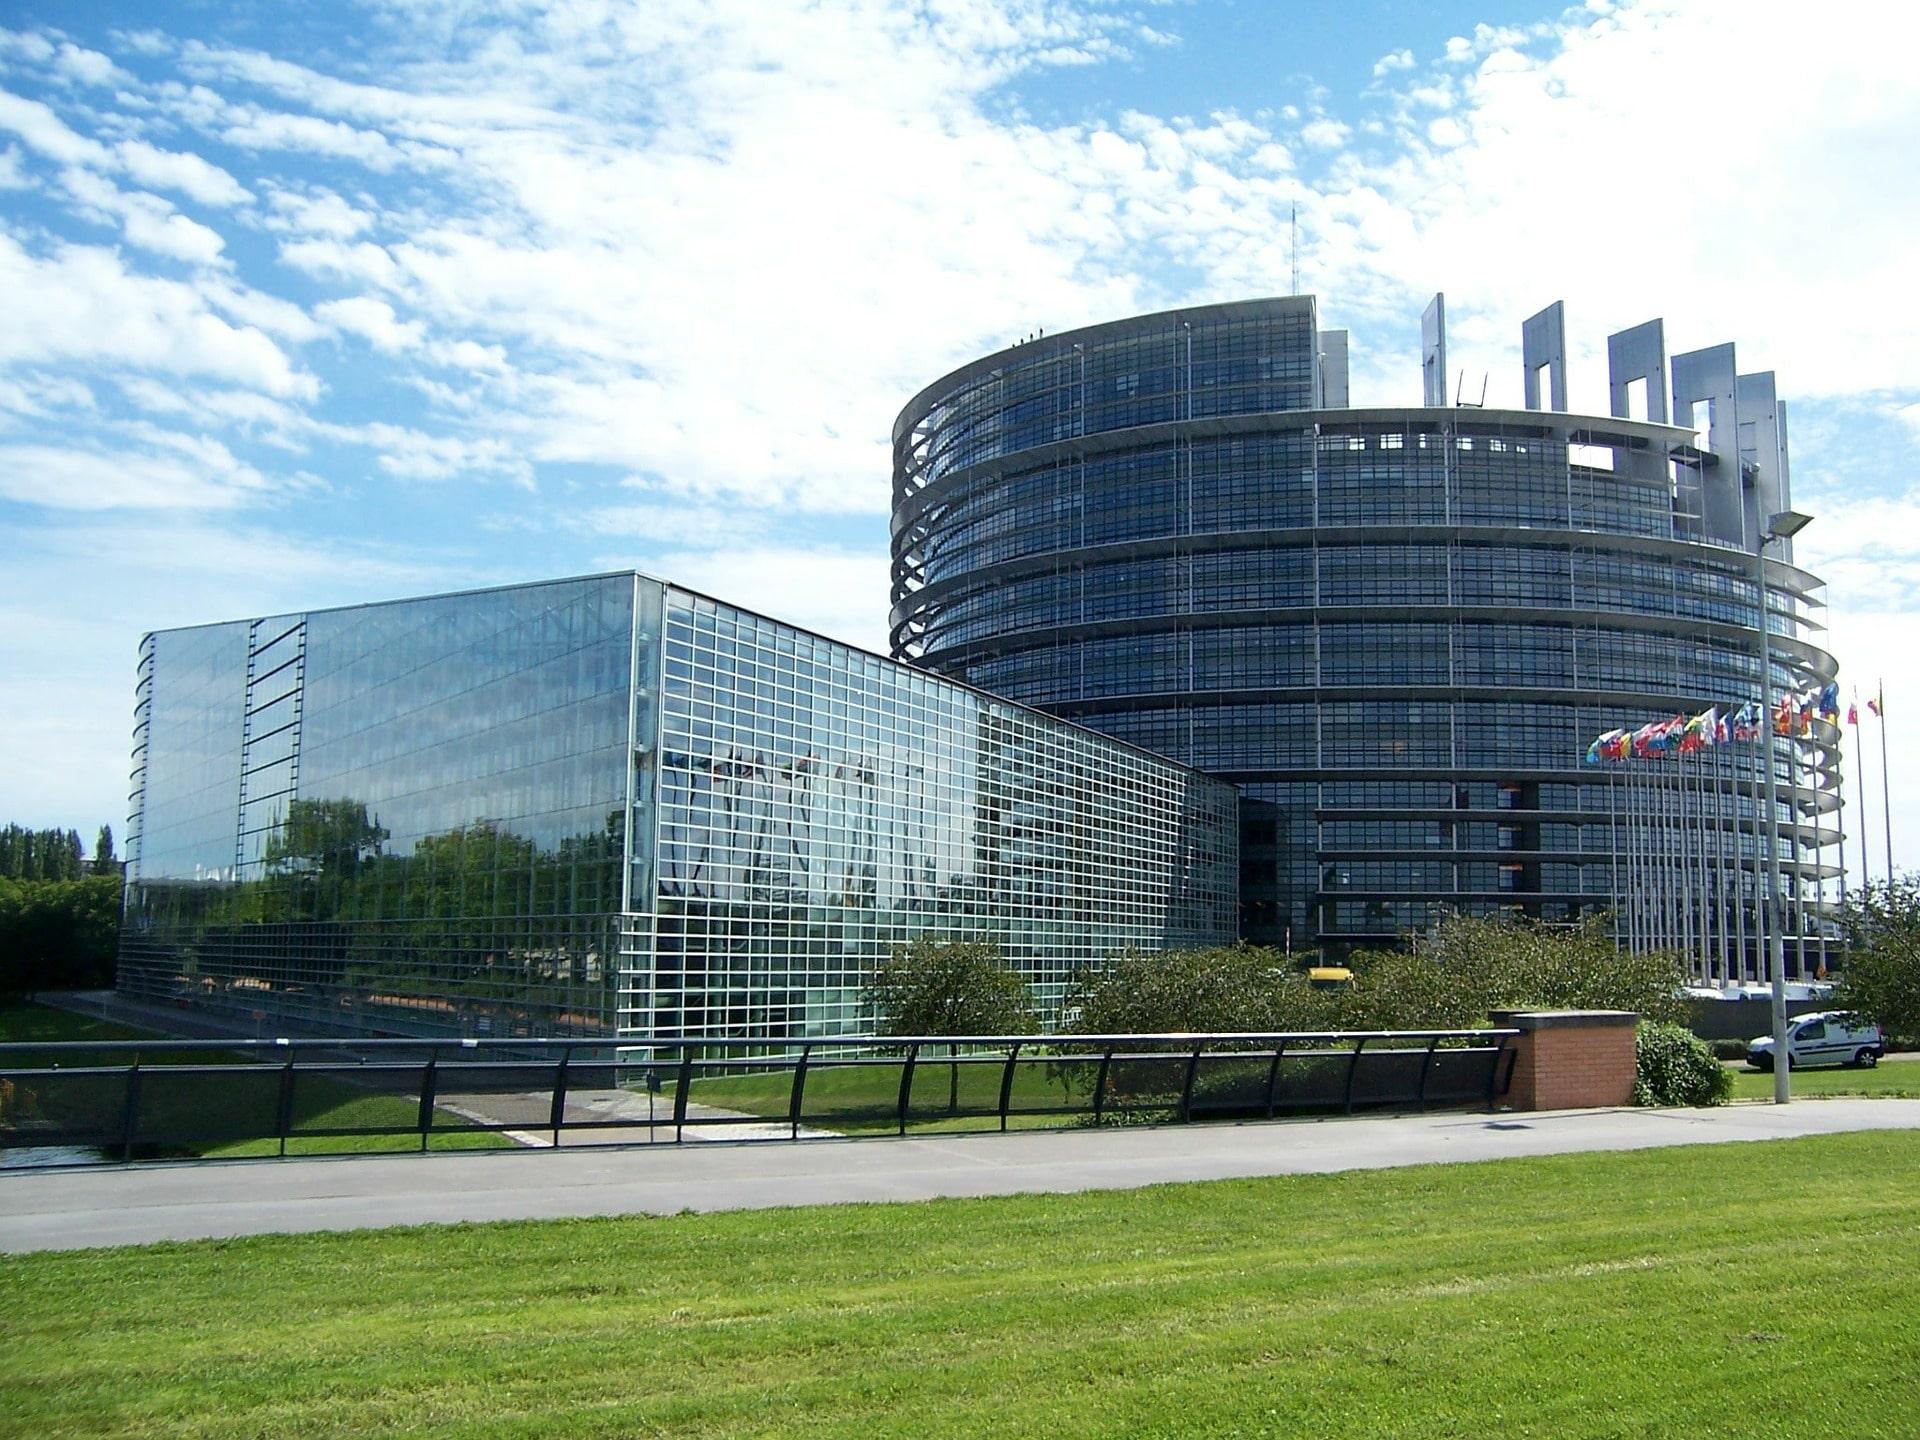 EU Parliament vote brings national re-use discussions a step closer